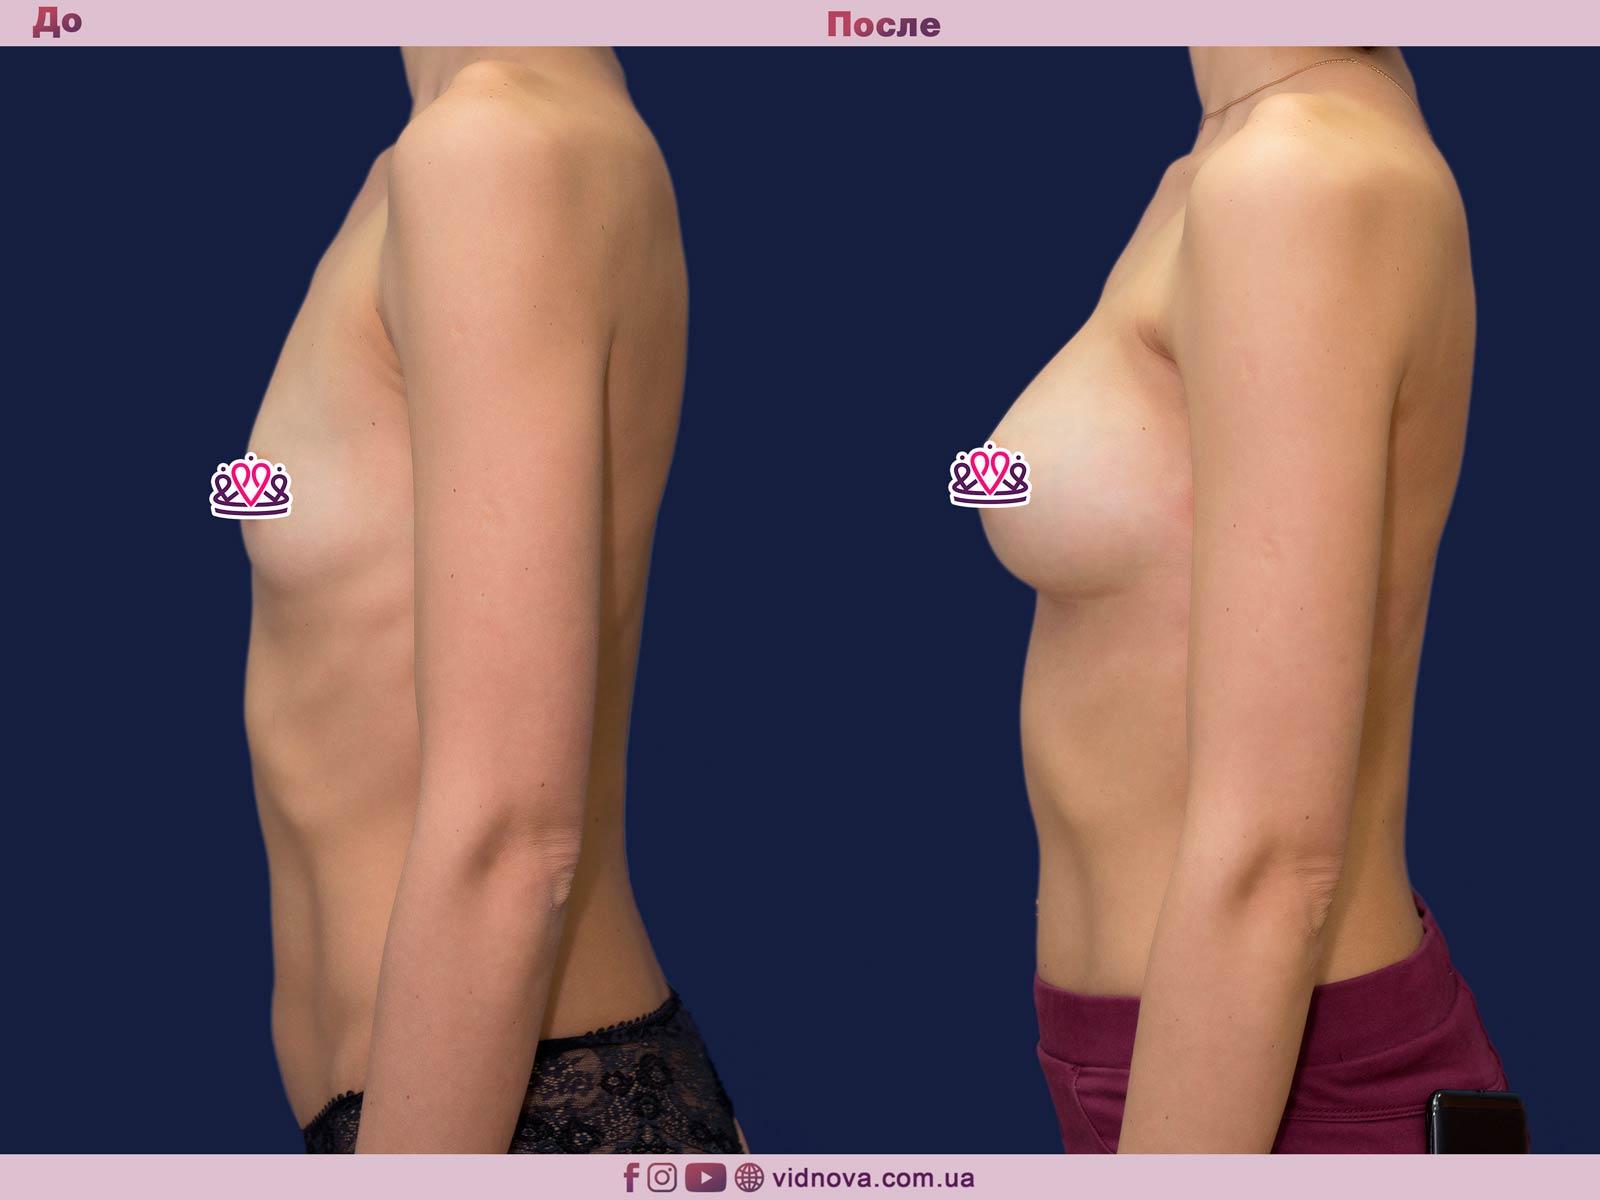 Увеличение груди: Фото ДО и ПОСЛЕ - Пример №76-3 - Клиника Vidnova